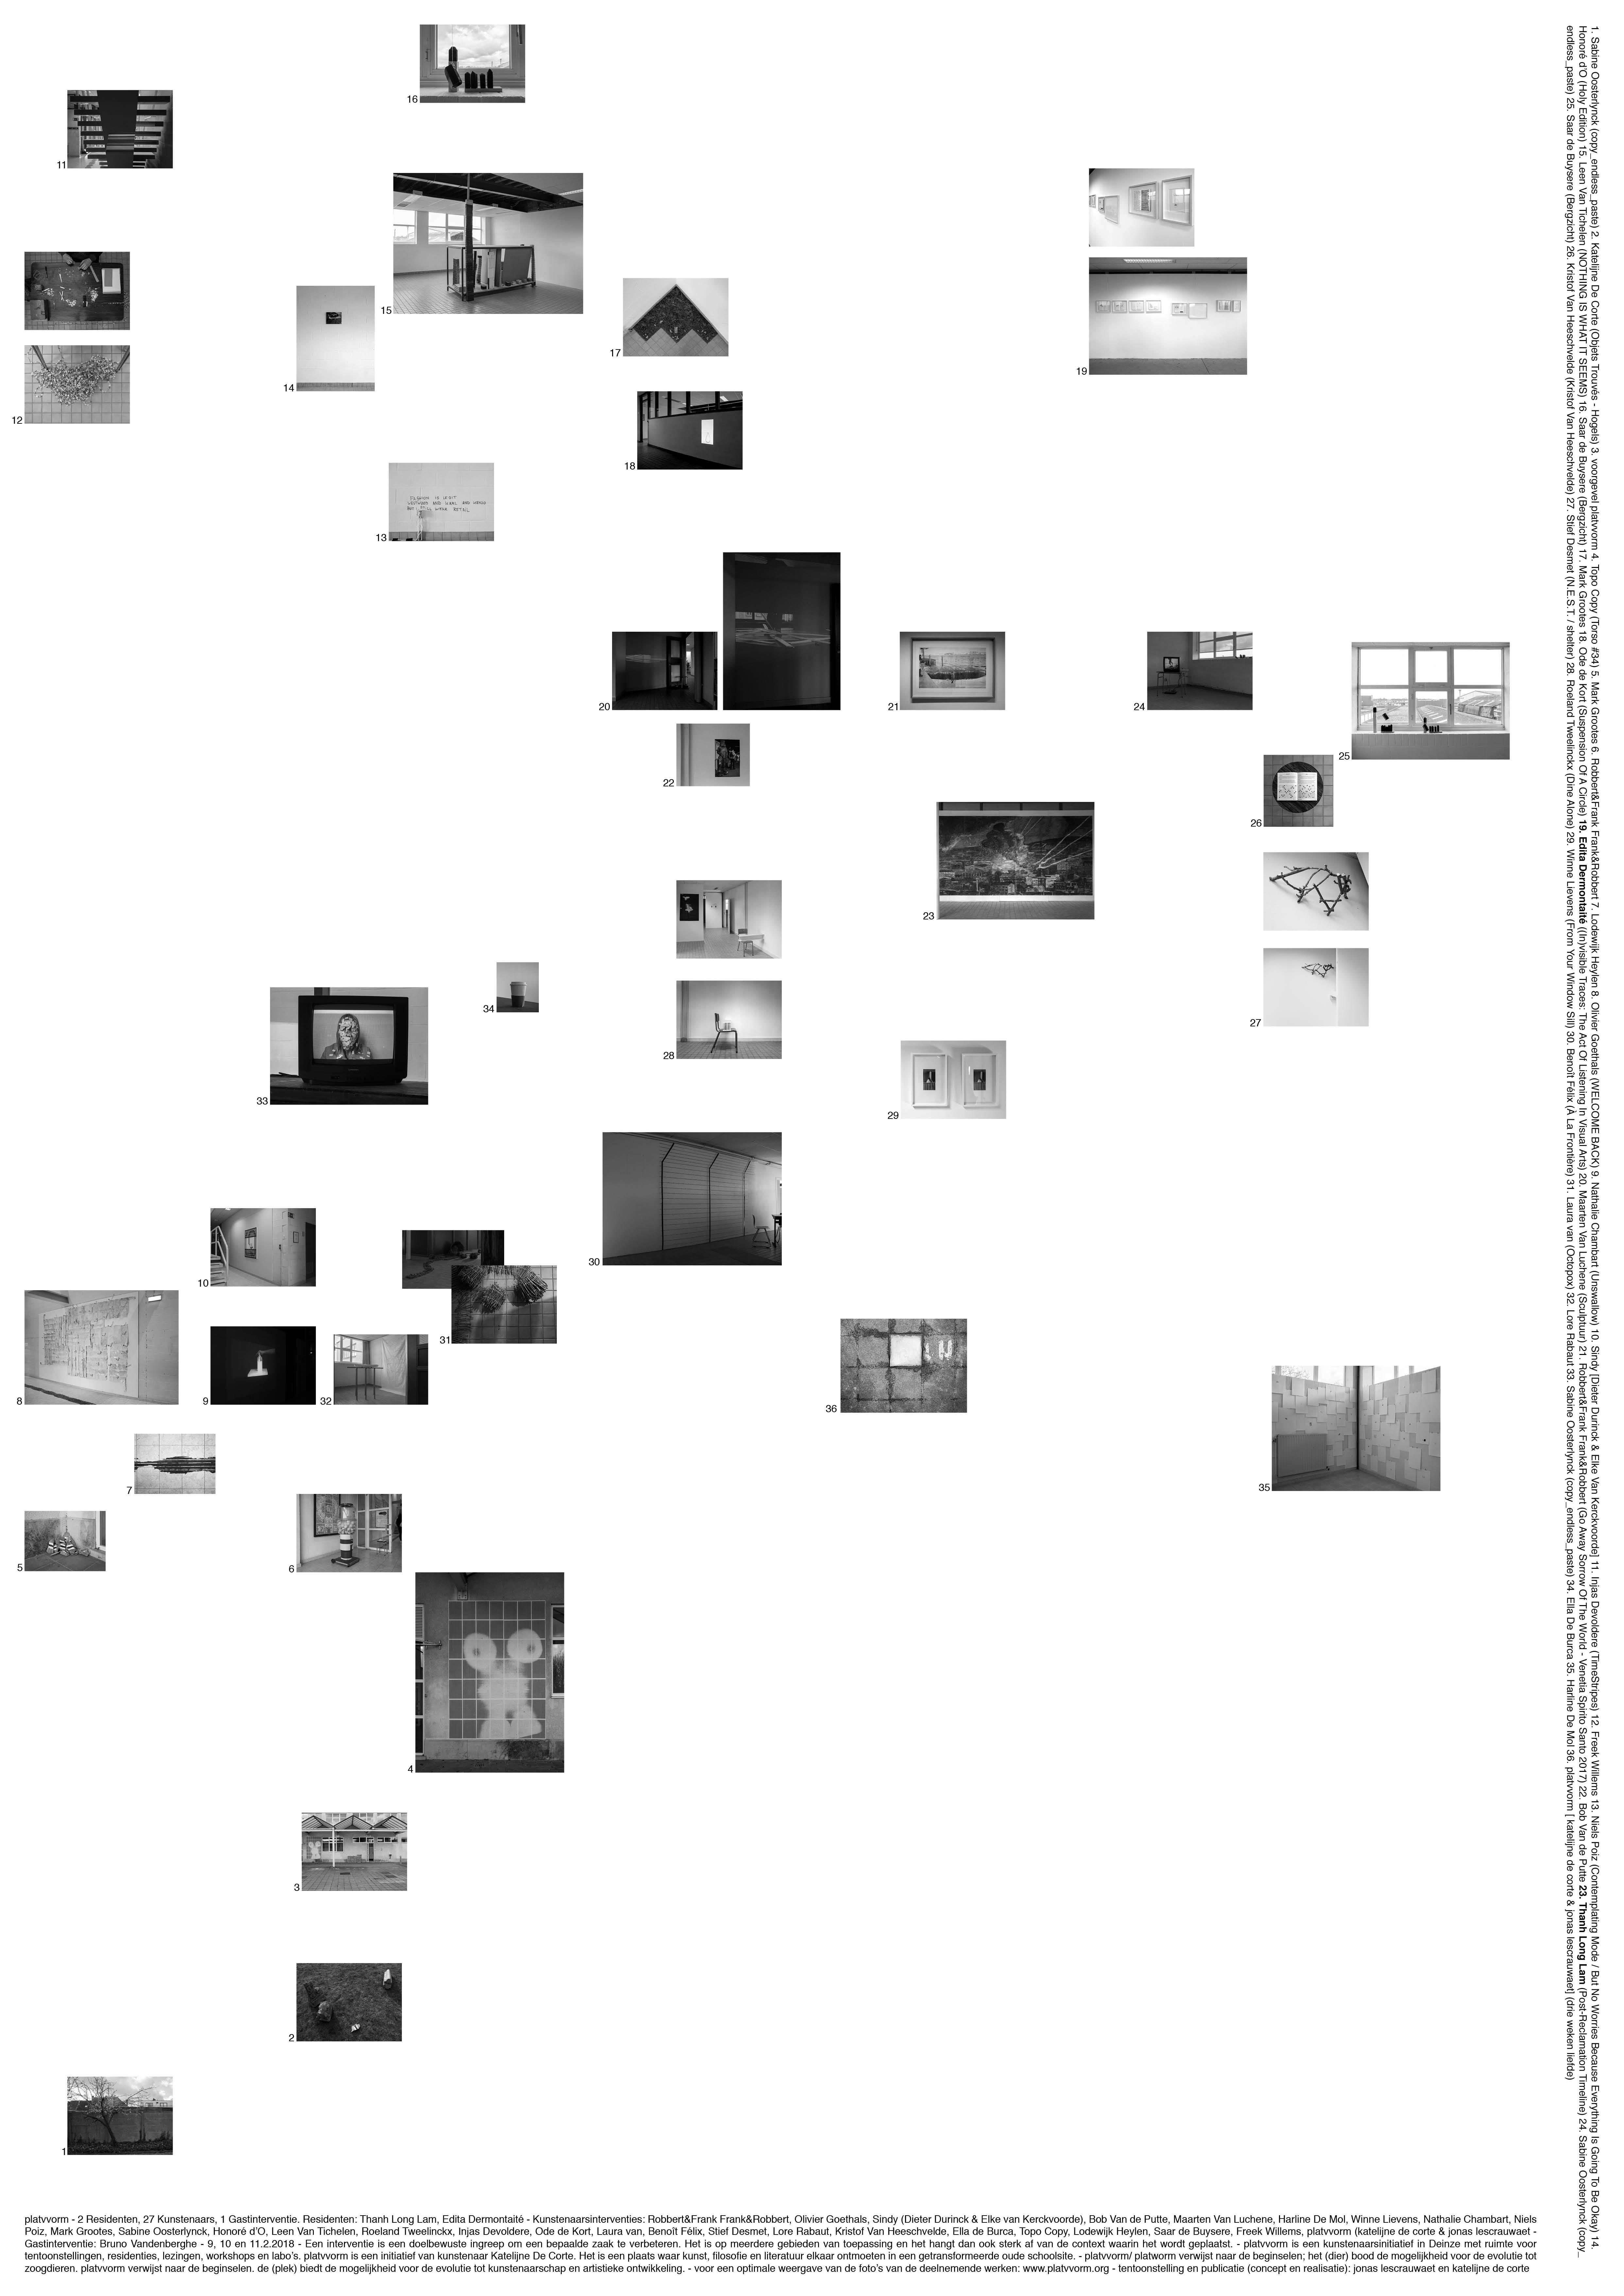 20180403_publicatie_interventies_A0_jl_kdc_FINAL